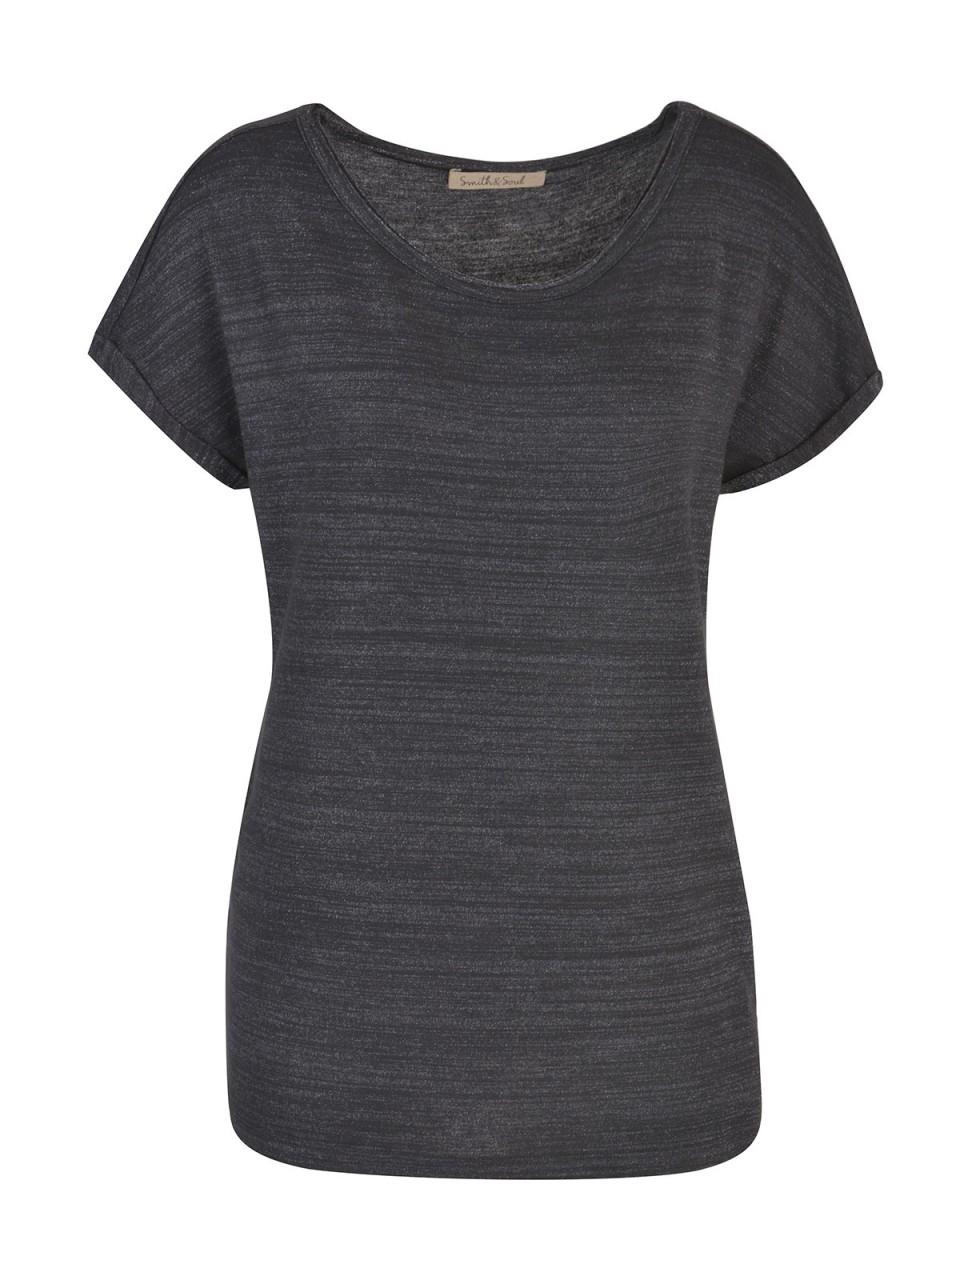 smith-amp-soul-damen-t-shirt-schwarz